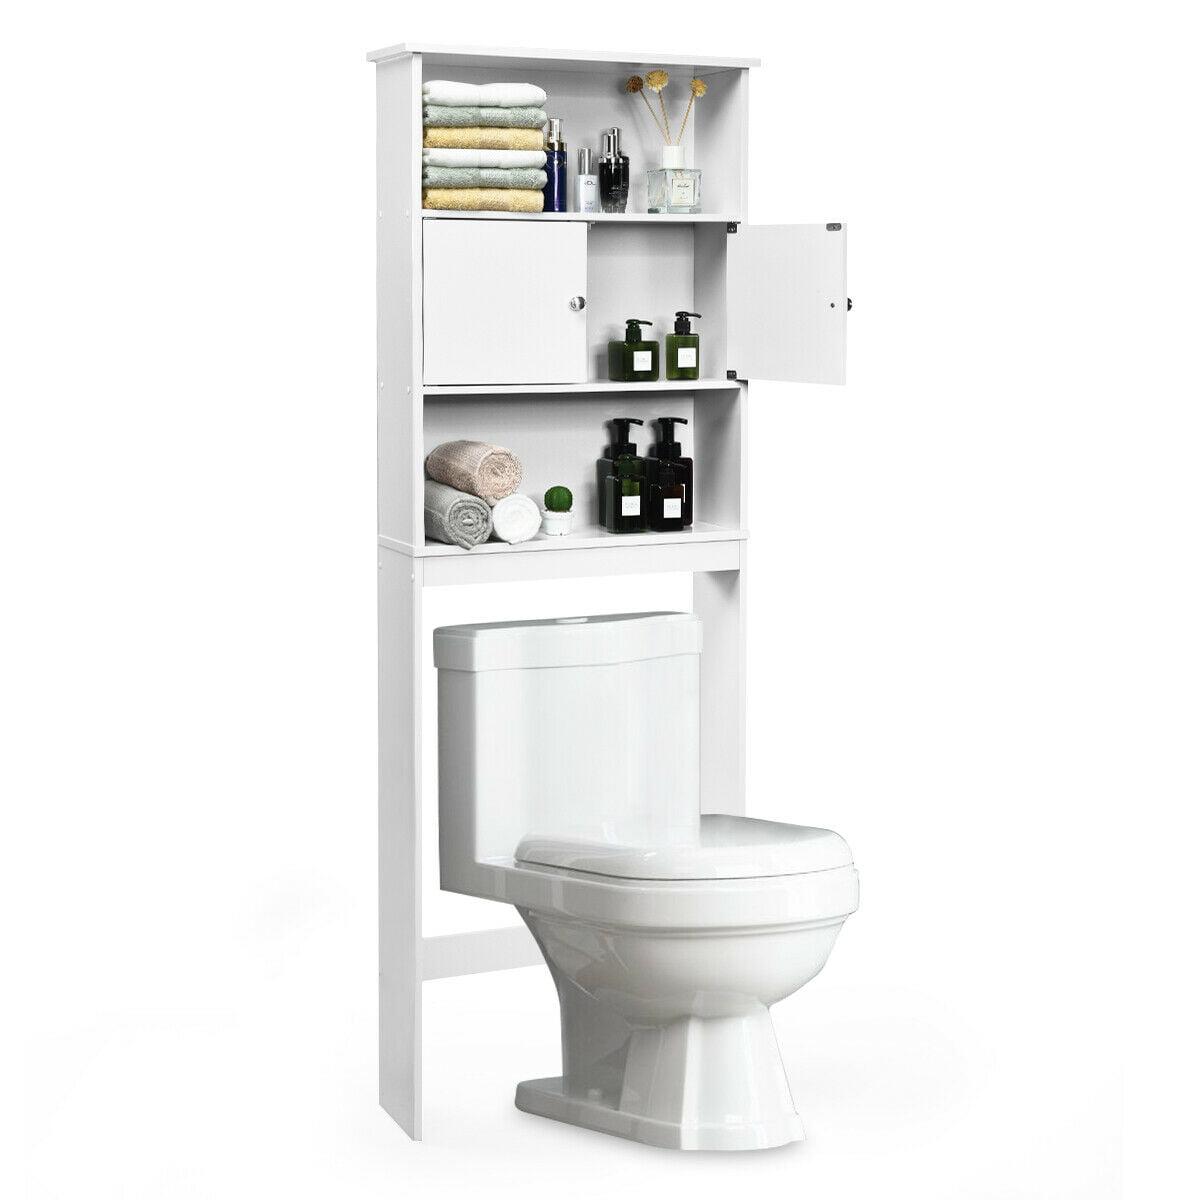 Gymax Bathroom Wood Organizer Shelf Over The Toilet Storage